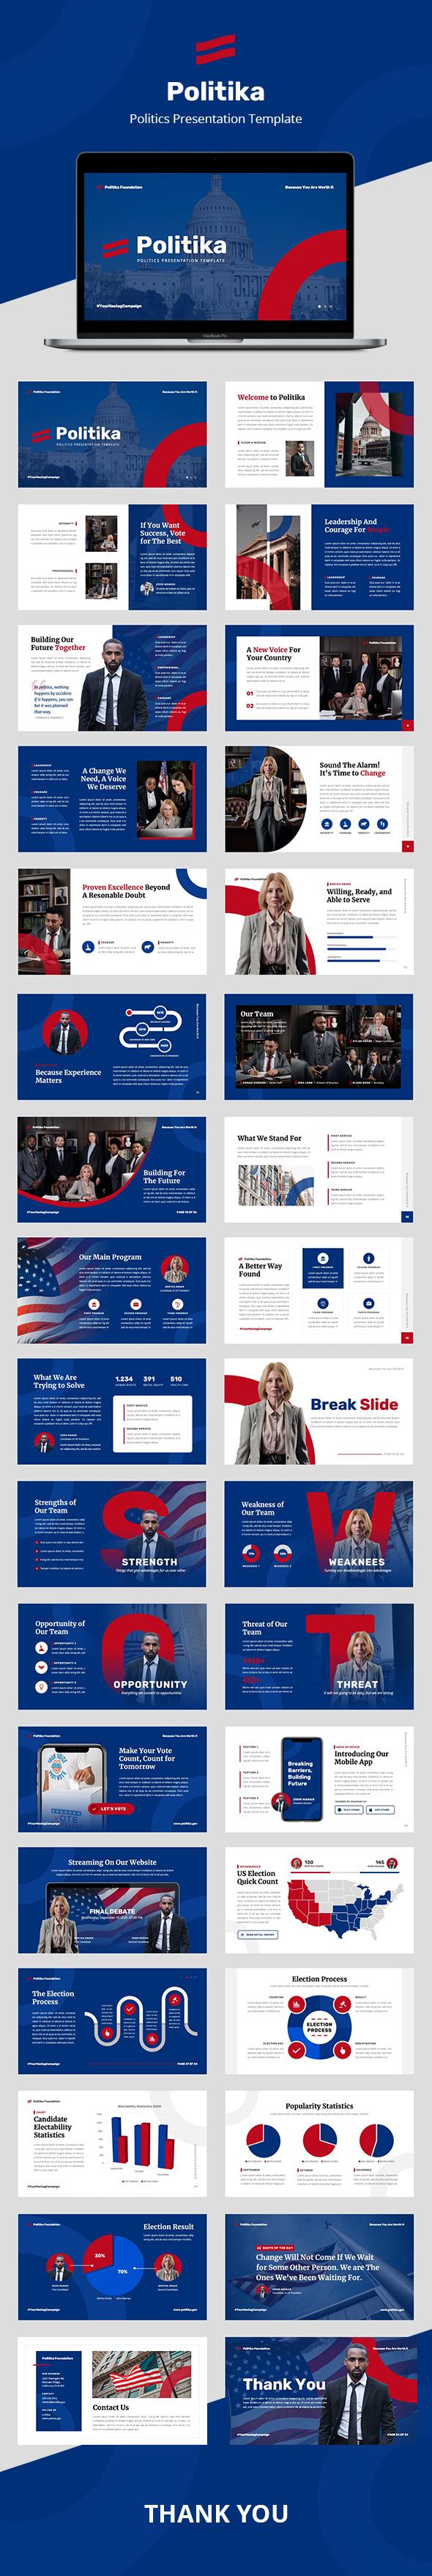 Politika: Politics PowerPoint Template